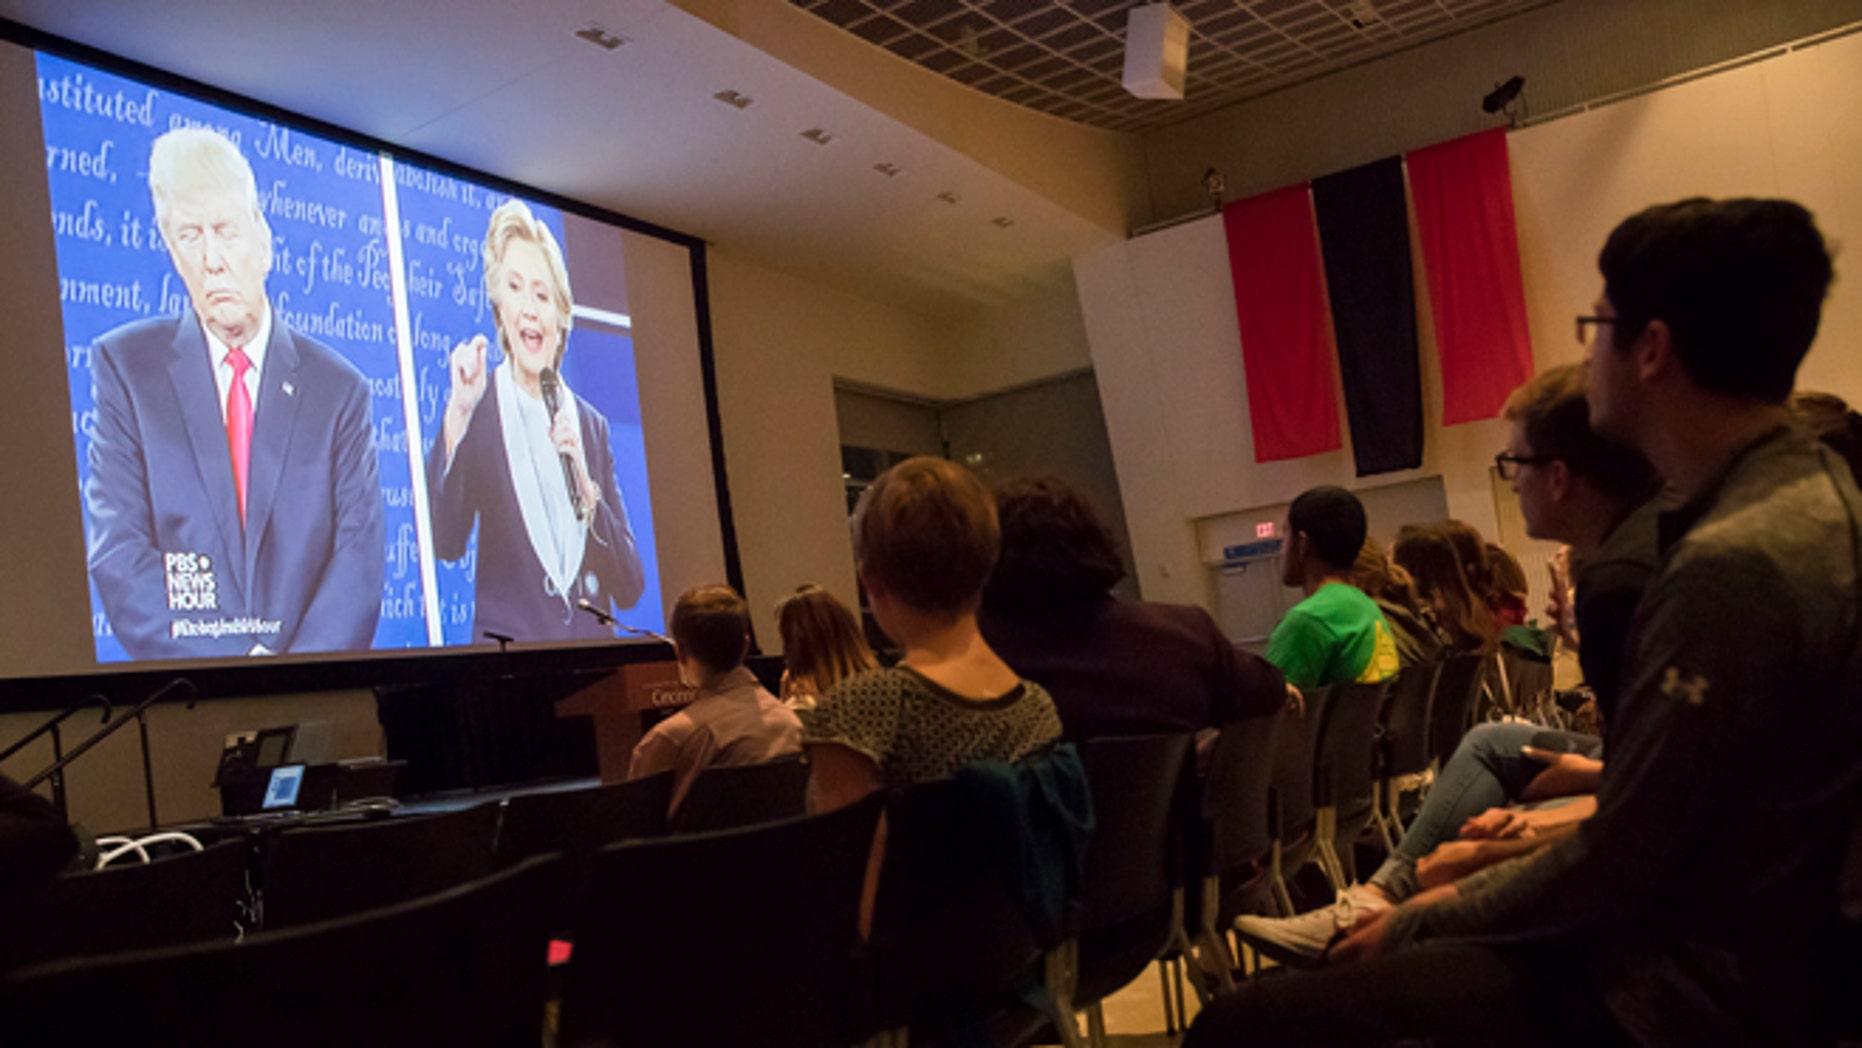 Second Presidential debate during a watch party at the University of Cincinnati, Sunday, Oct. 9, 2016, in Cincinnati.